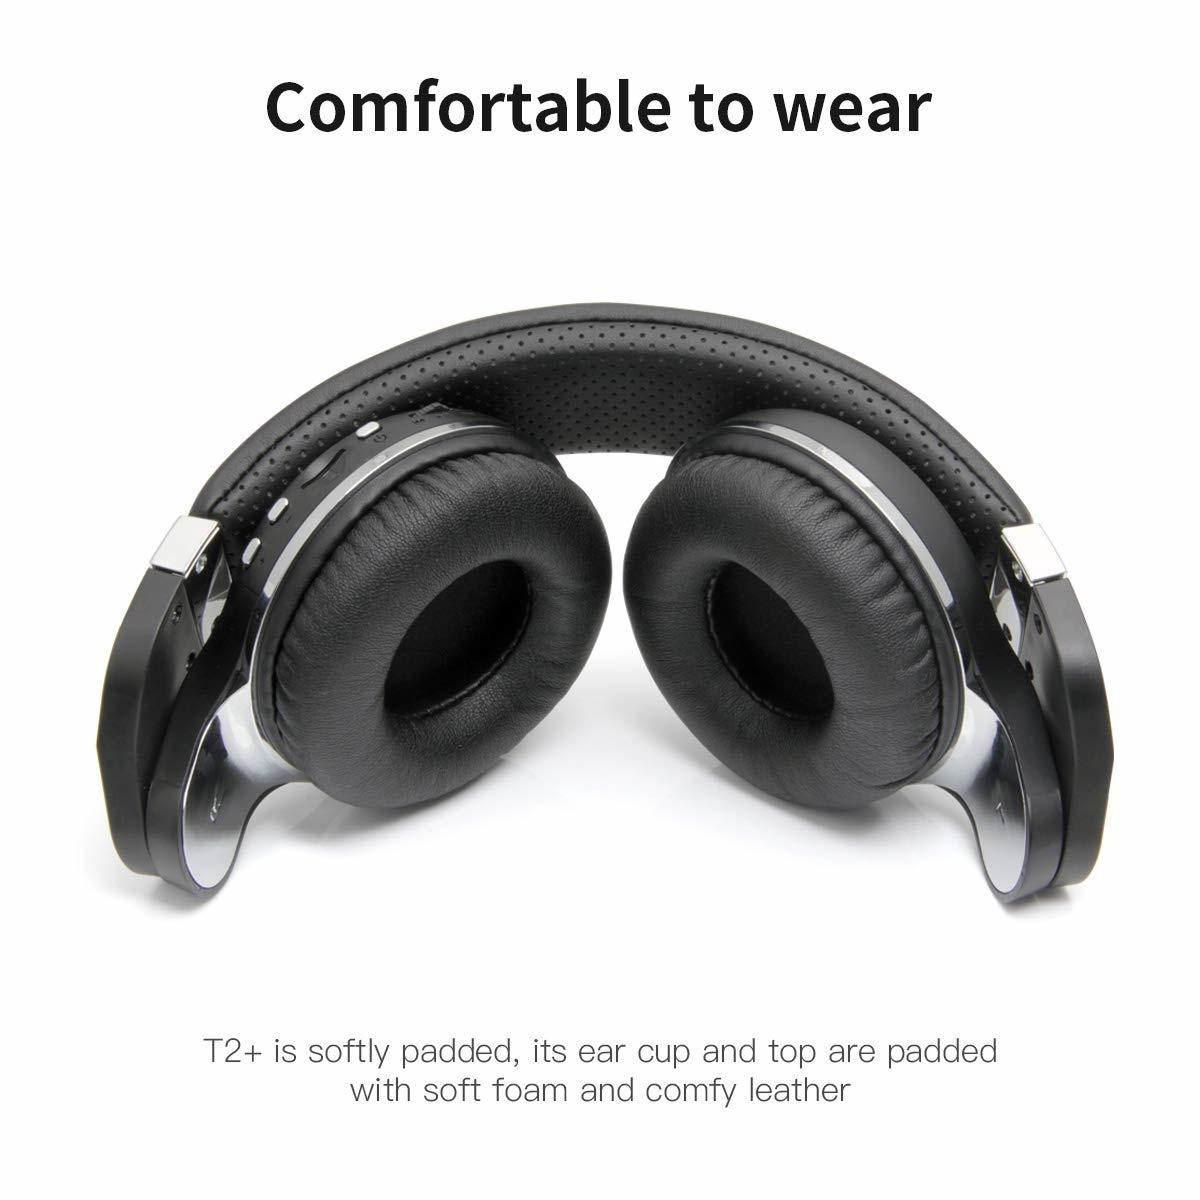 Bluedio T2VBCA01 T2 + (Turbine 2 plus) Bluetooth draadloze hoofdtelefoon met Micro SD / FM-radiofunctie